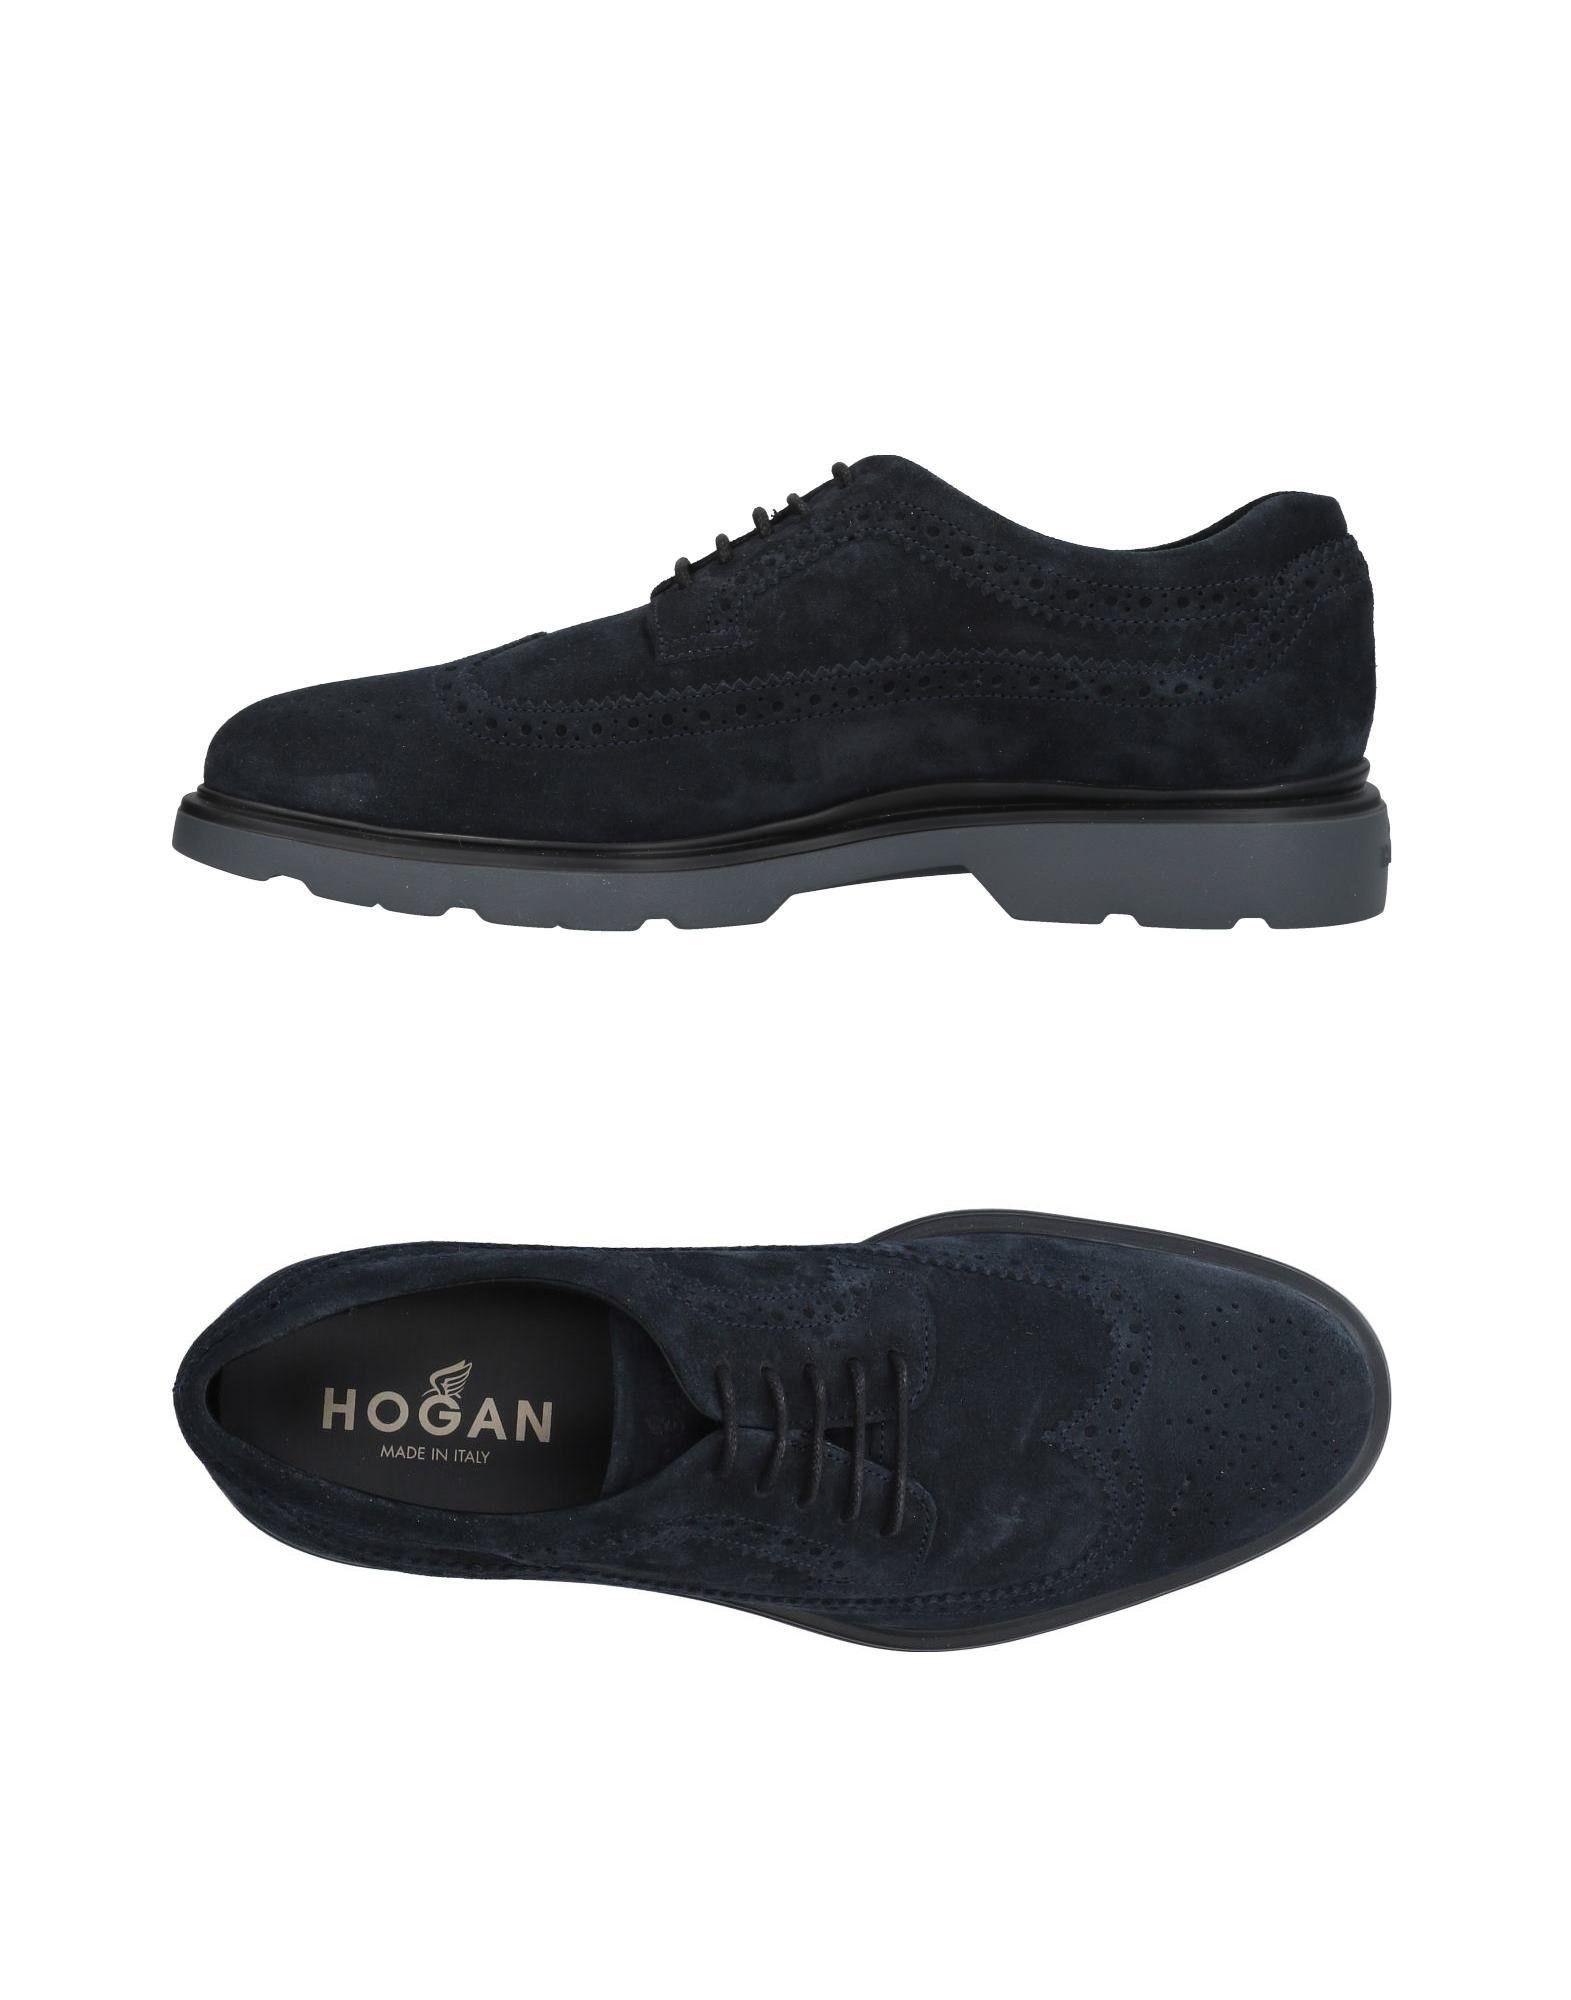 Stringate Hogan Uomo - Acquista online su